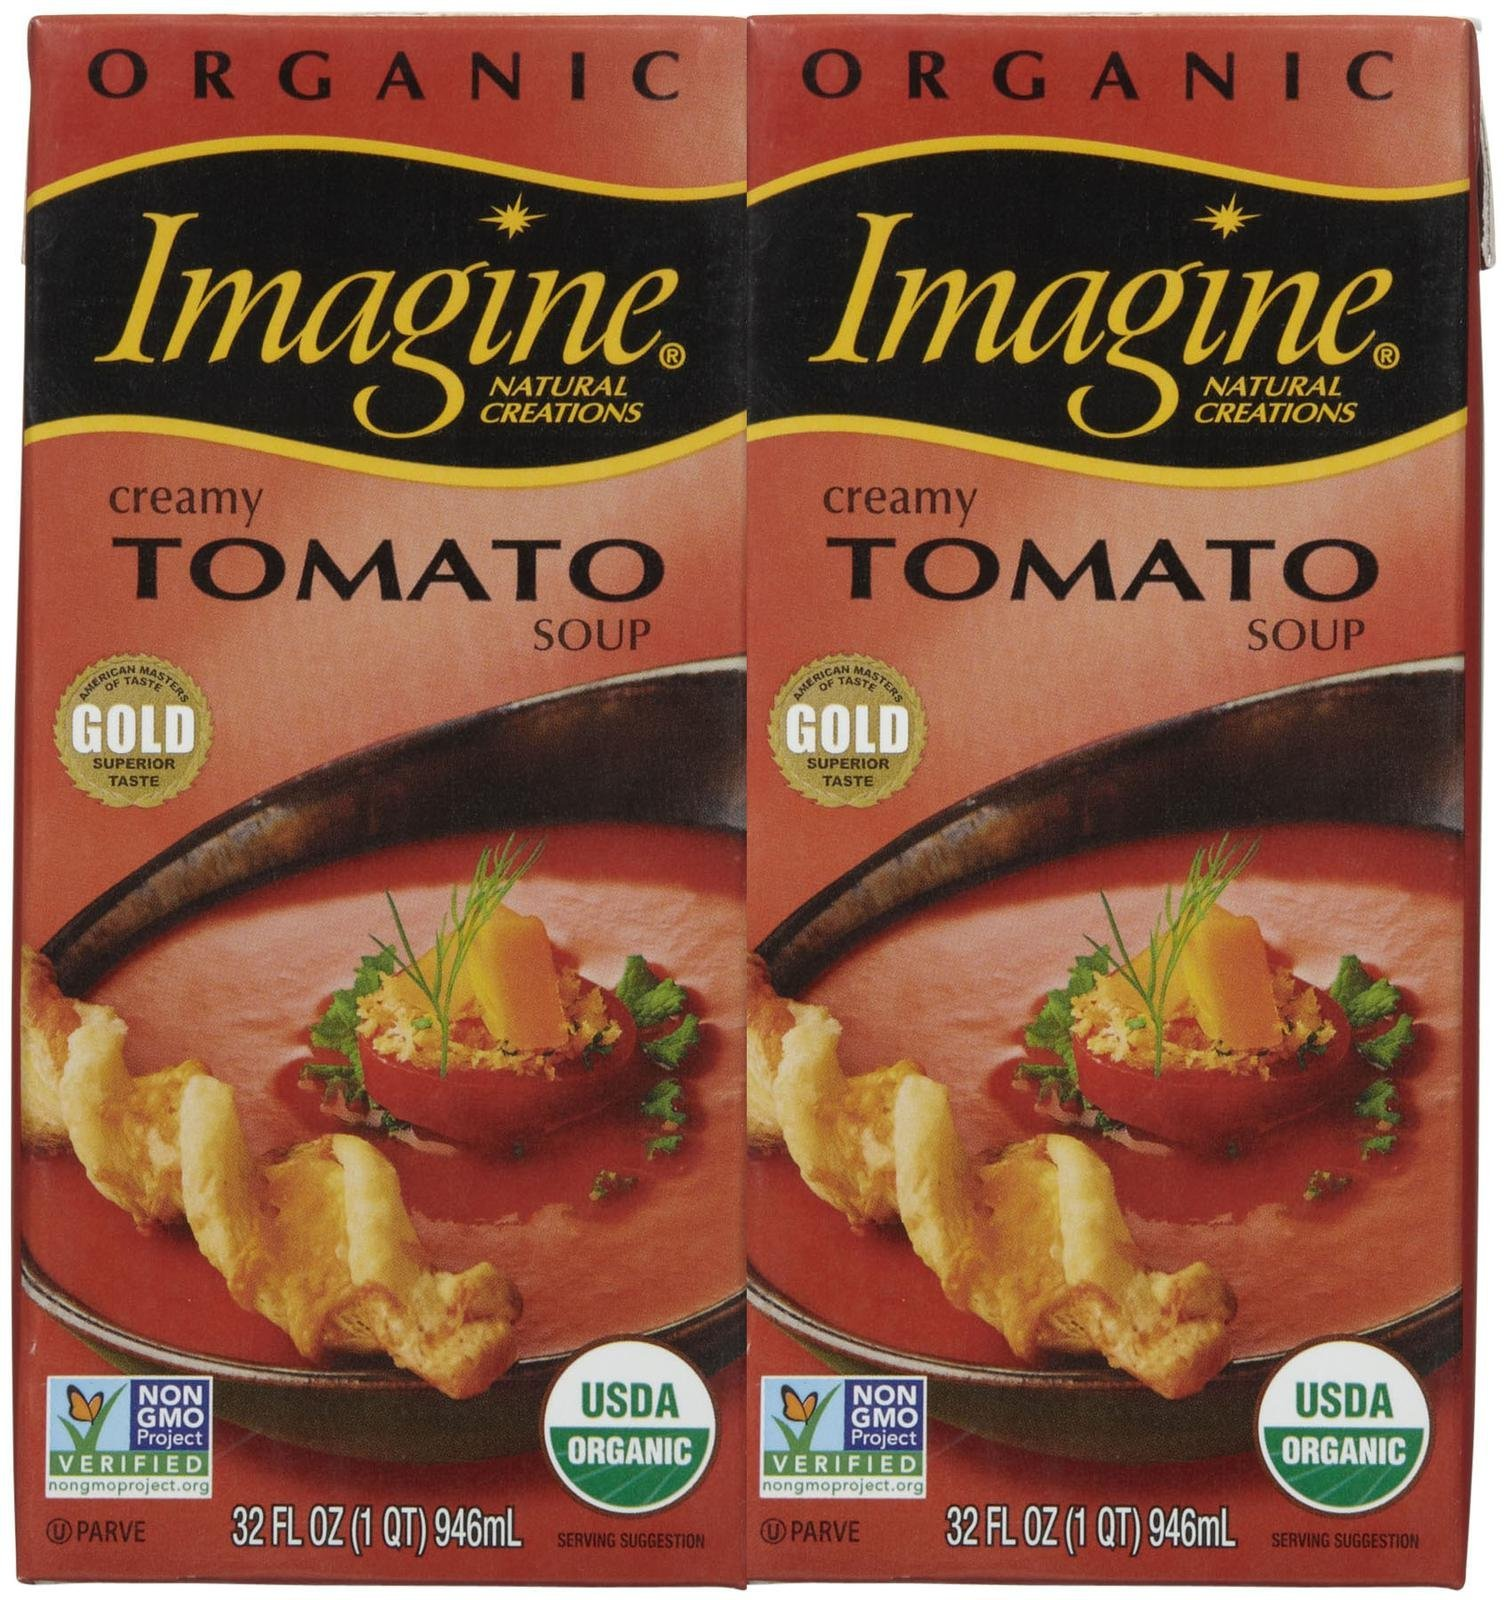 Imagine Organic Creamy Tomato Soup, 3 pk./32 oz.